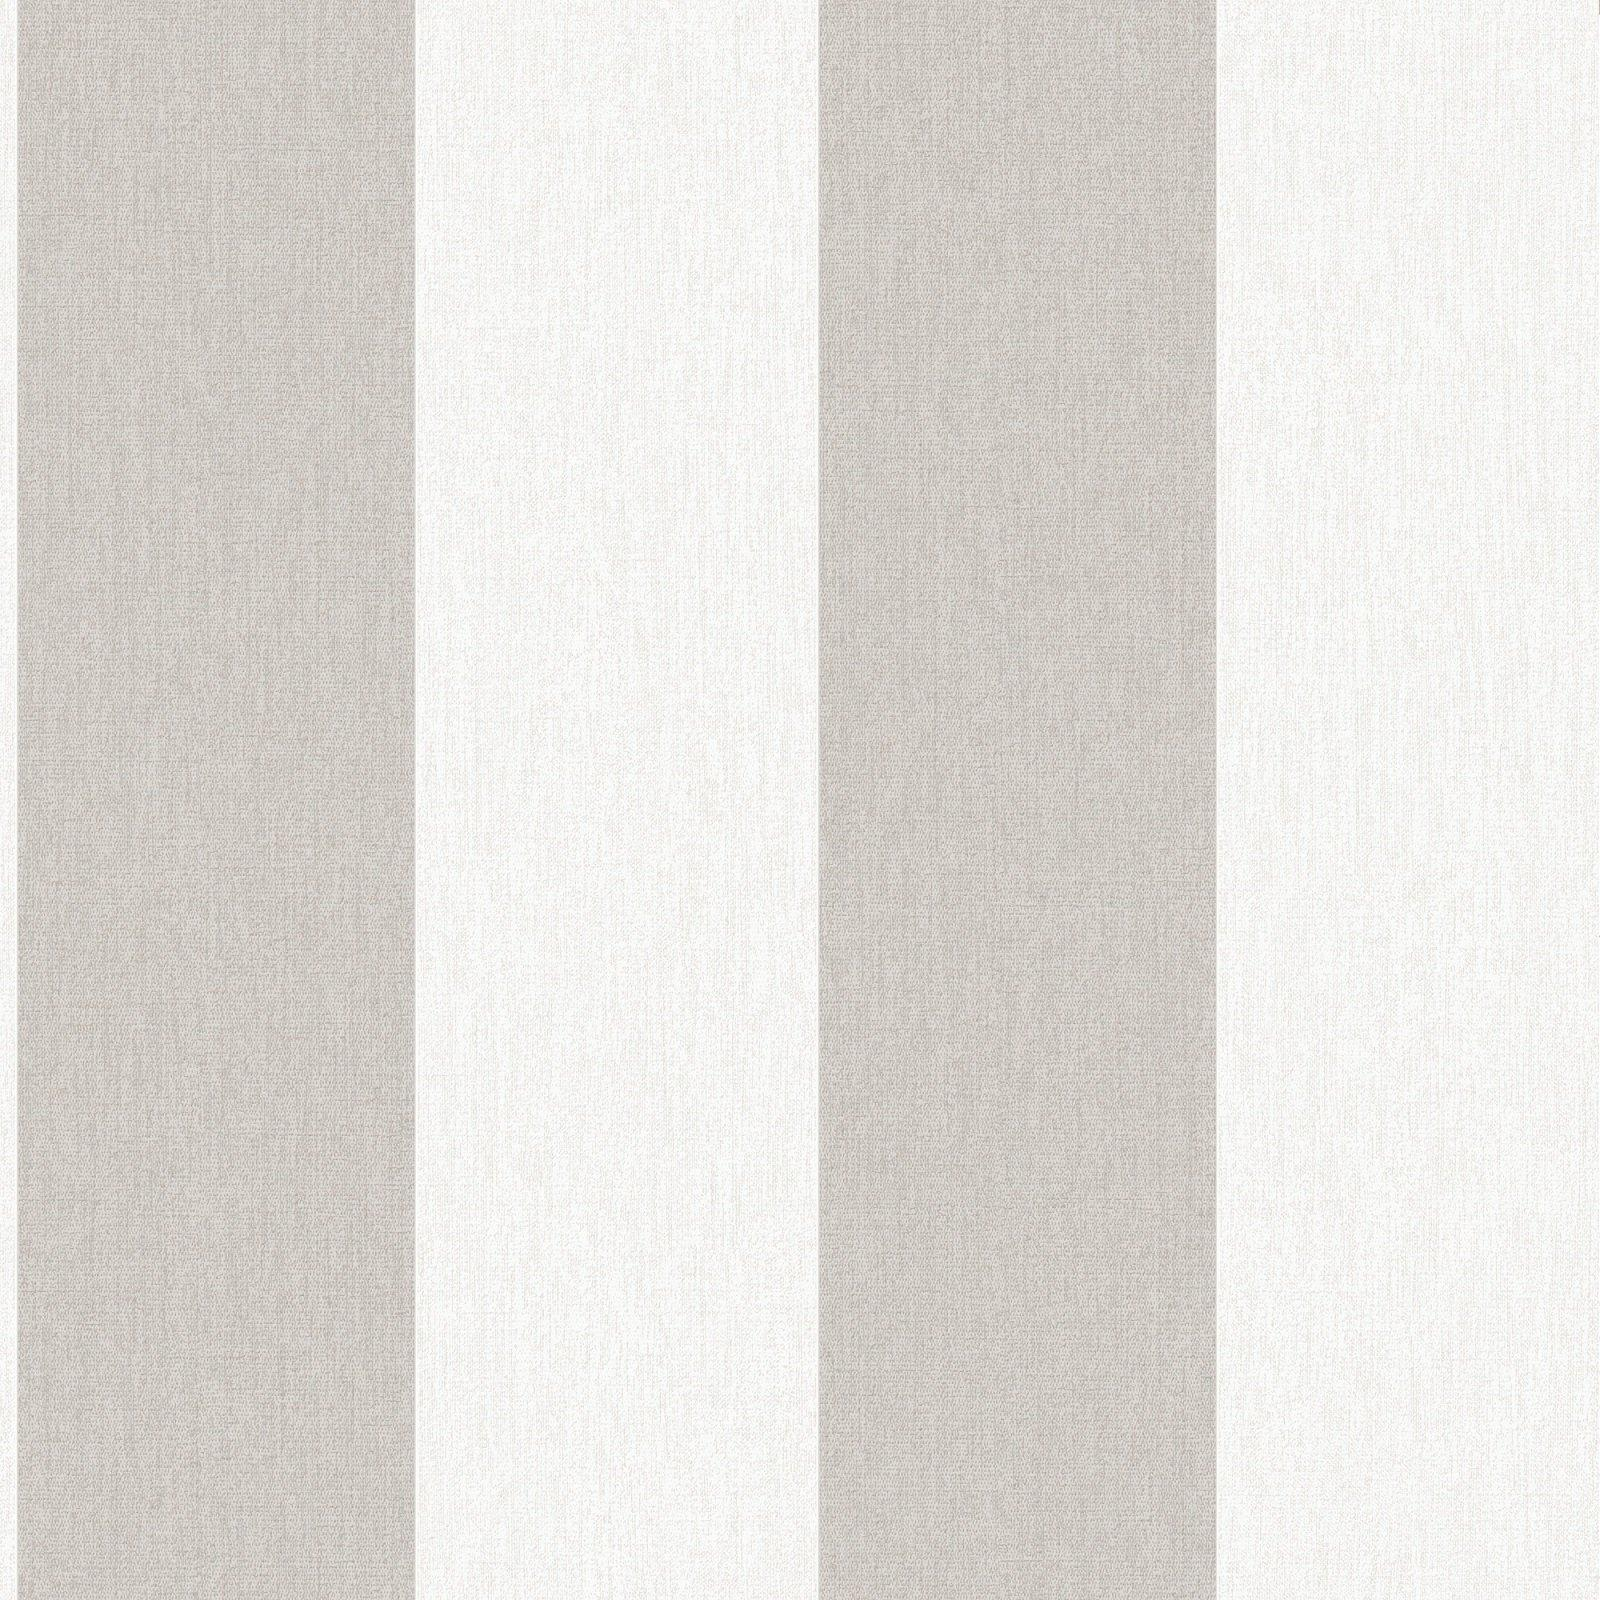 Superfresco Easy 52cm x 10m Natural Calico Stripe Wallpaper